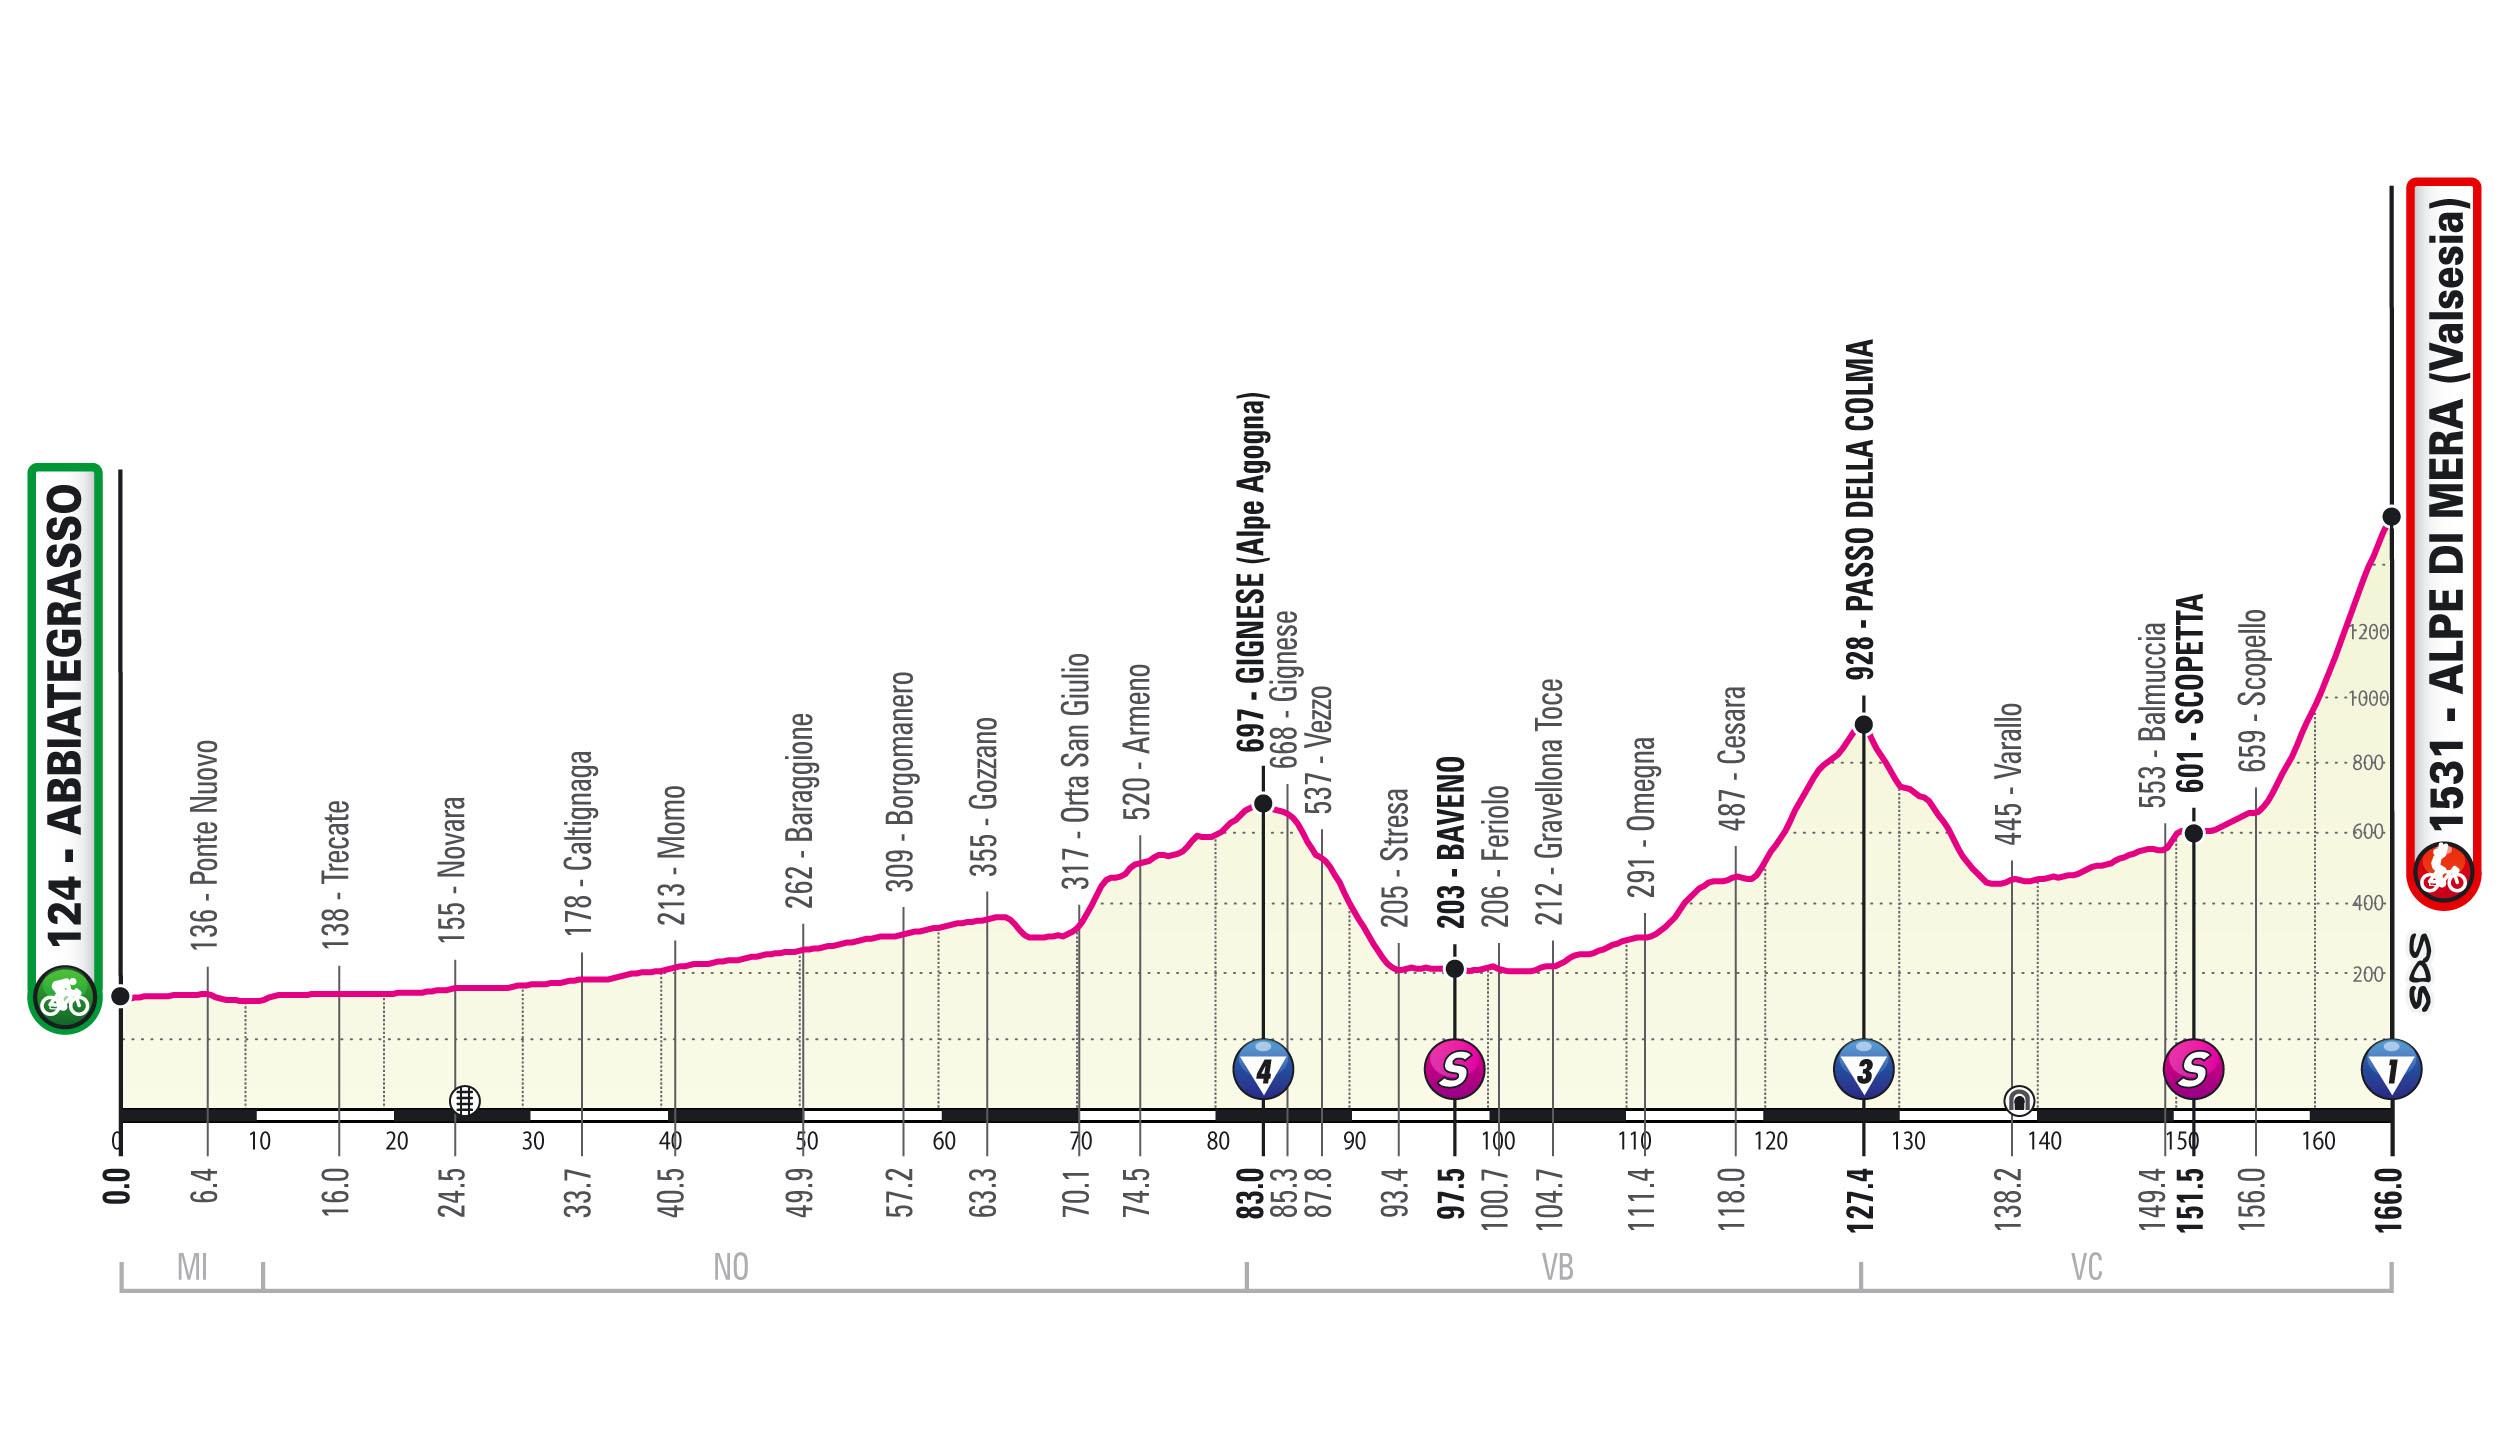 Profil Étape 19 Giro d'Italia 2021: Abbiategrasso, Alpe di Mera (Valsesia)